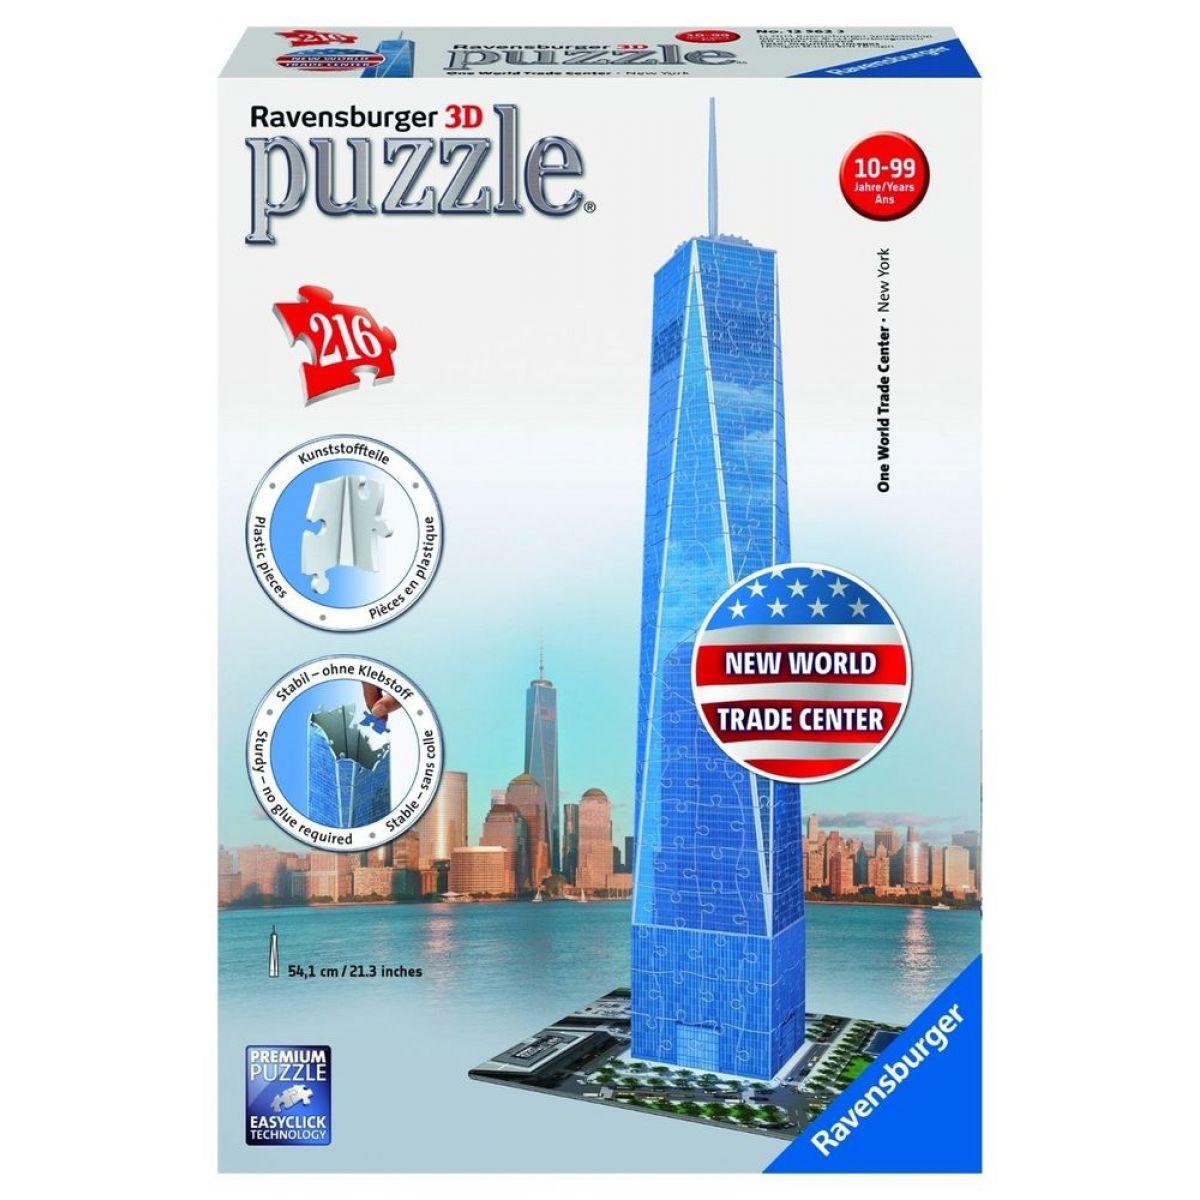 Ravensburger Puzzle 3D One World Trade Center 216 dílků